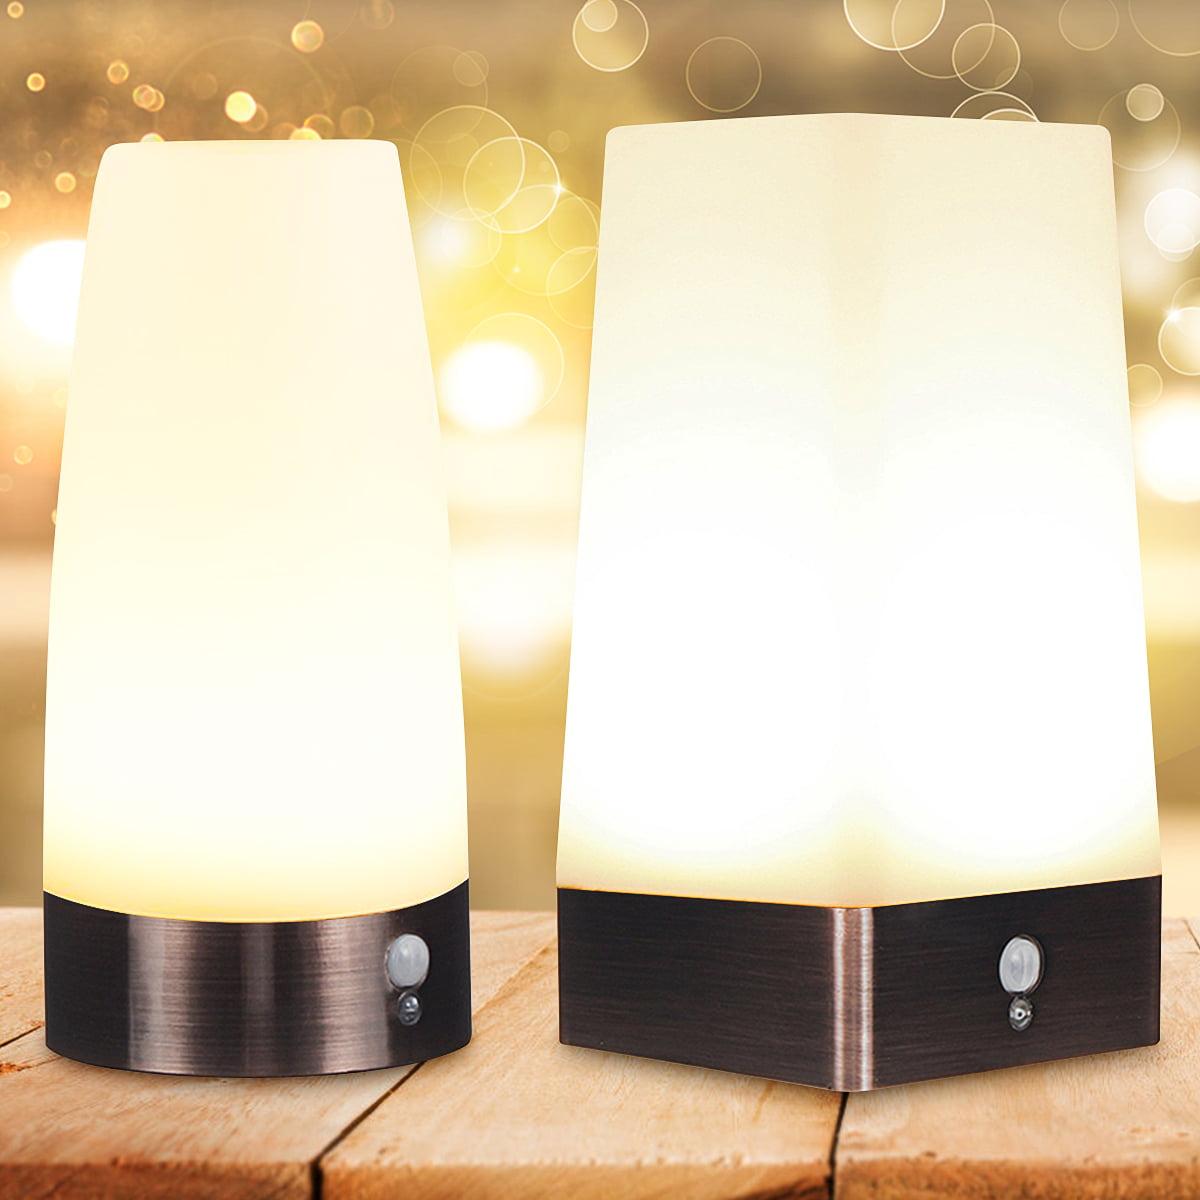 PIR Motion Sensor Night Light LED Indoor Electric Socket Wall Lamp Bedroom S0R1